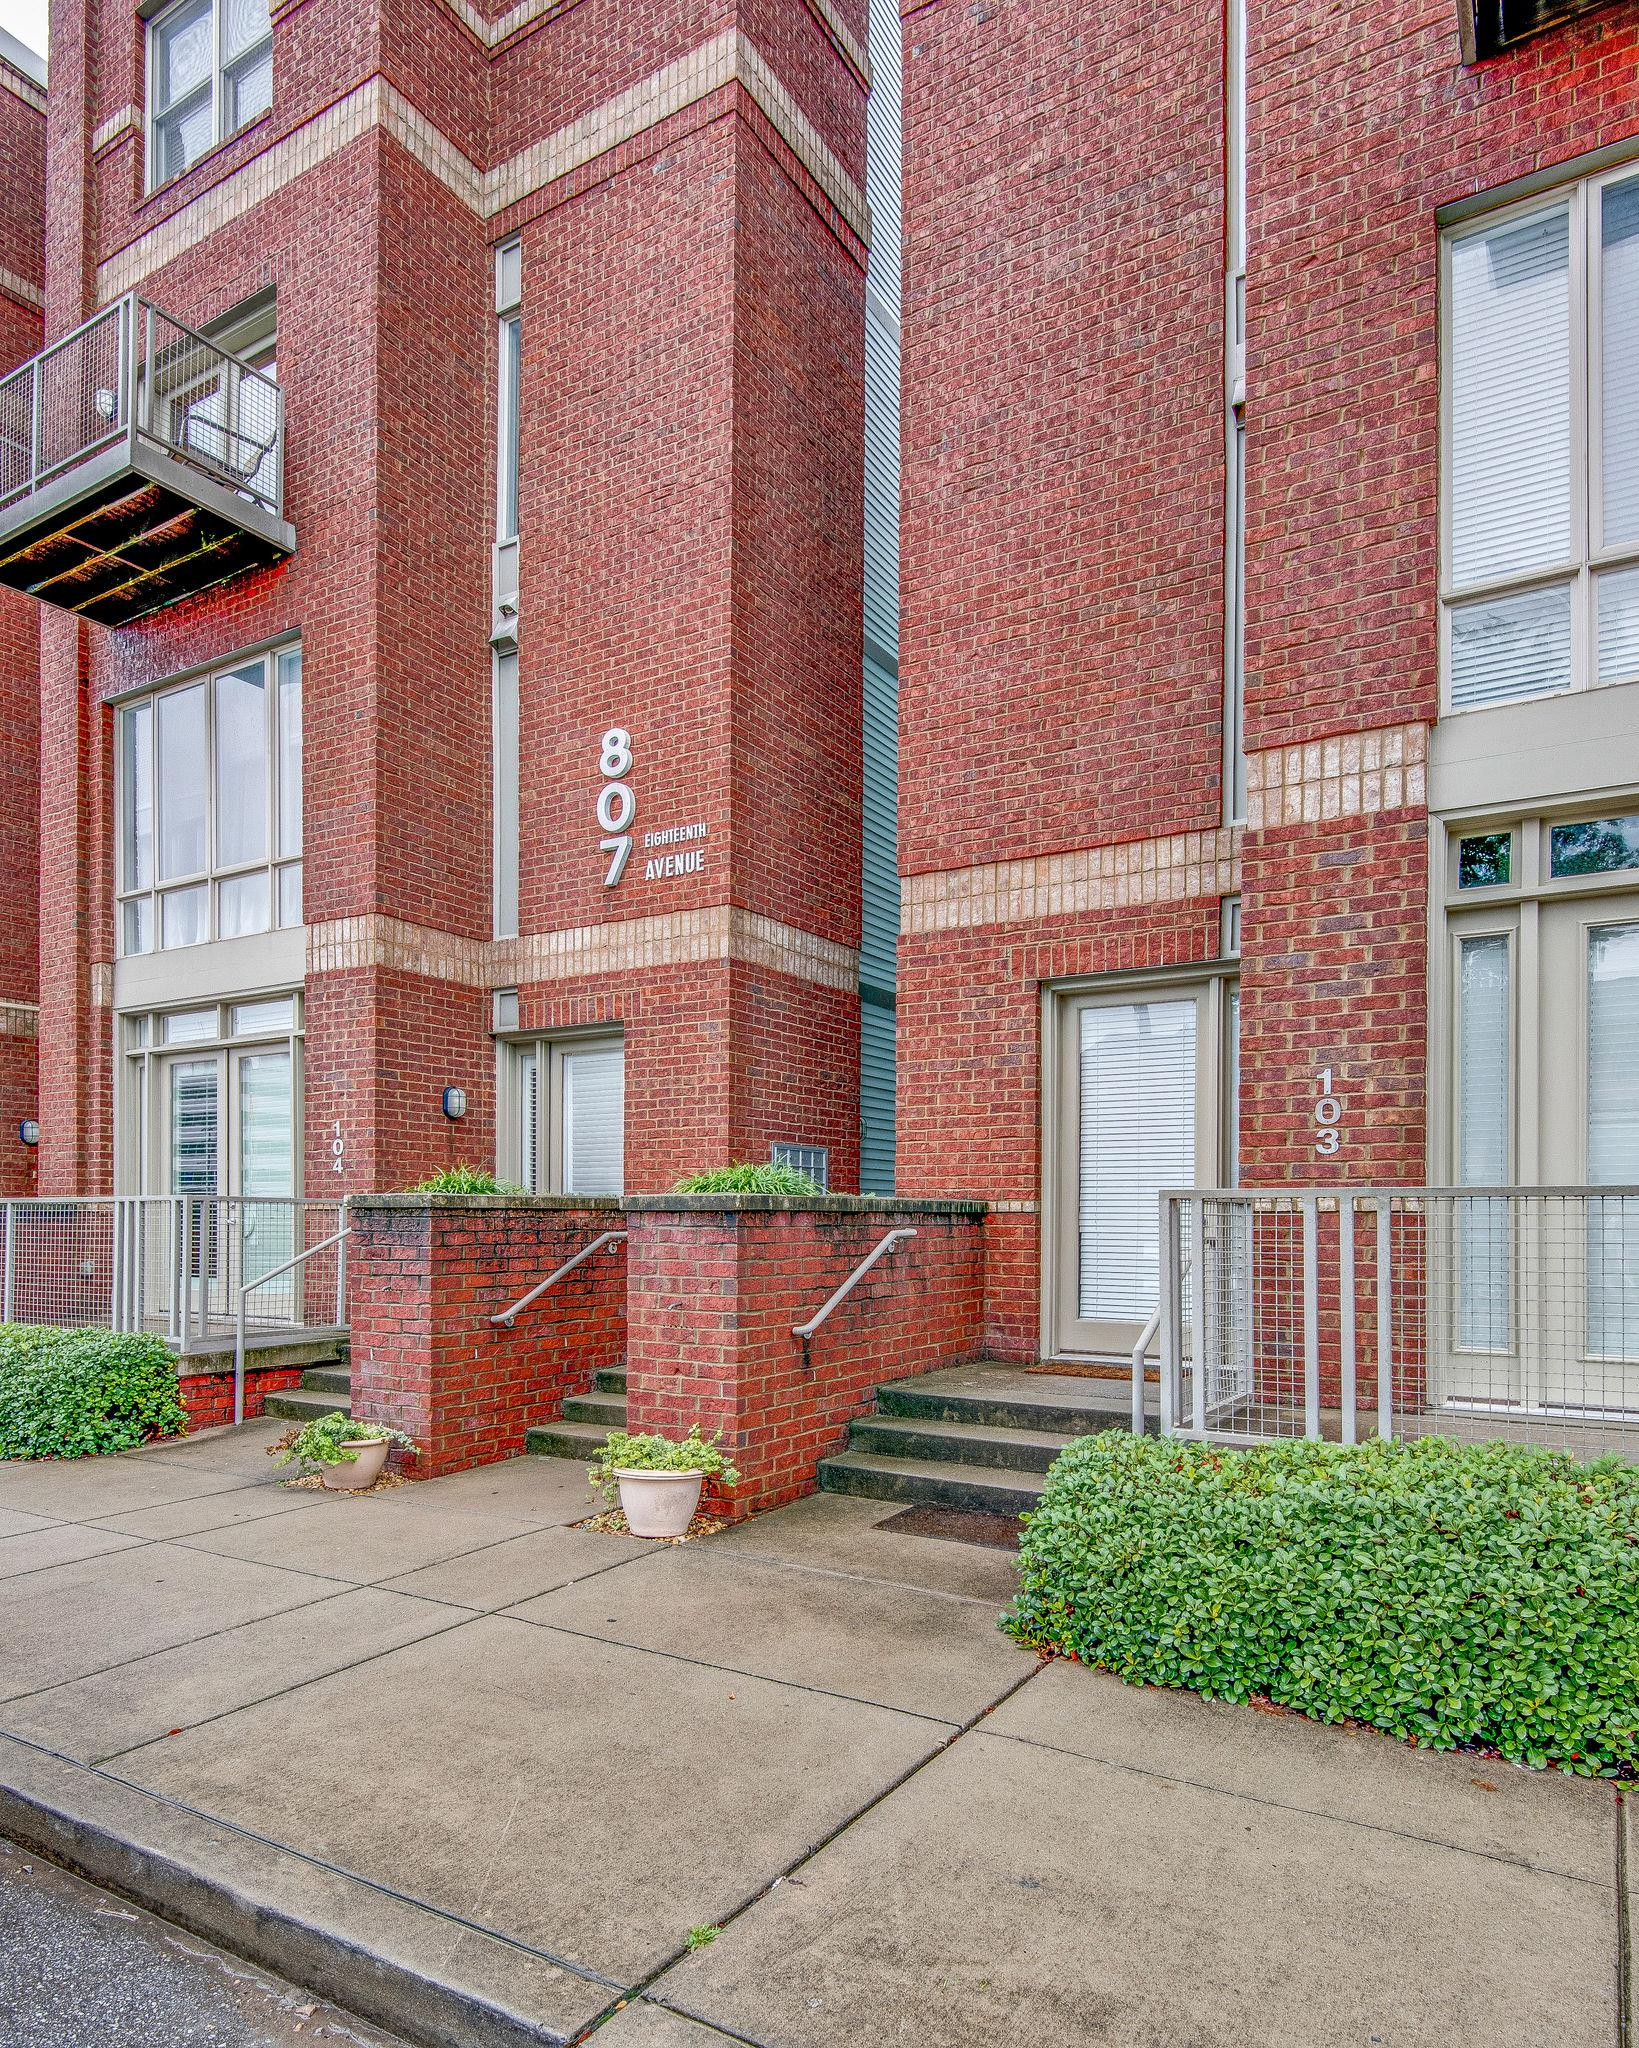 807 18th Ave S #411, Nashville, TN 37203 - Nashville, TN real estate listing